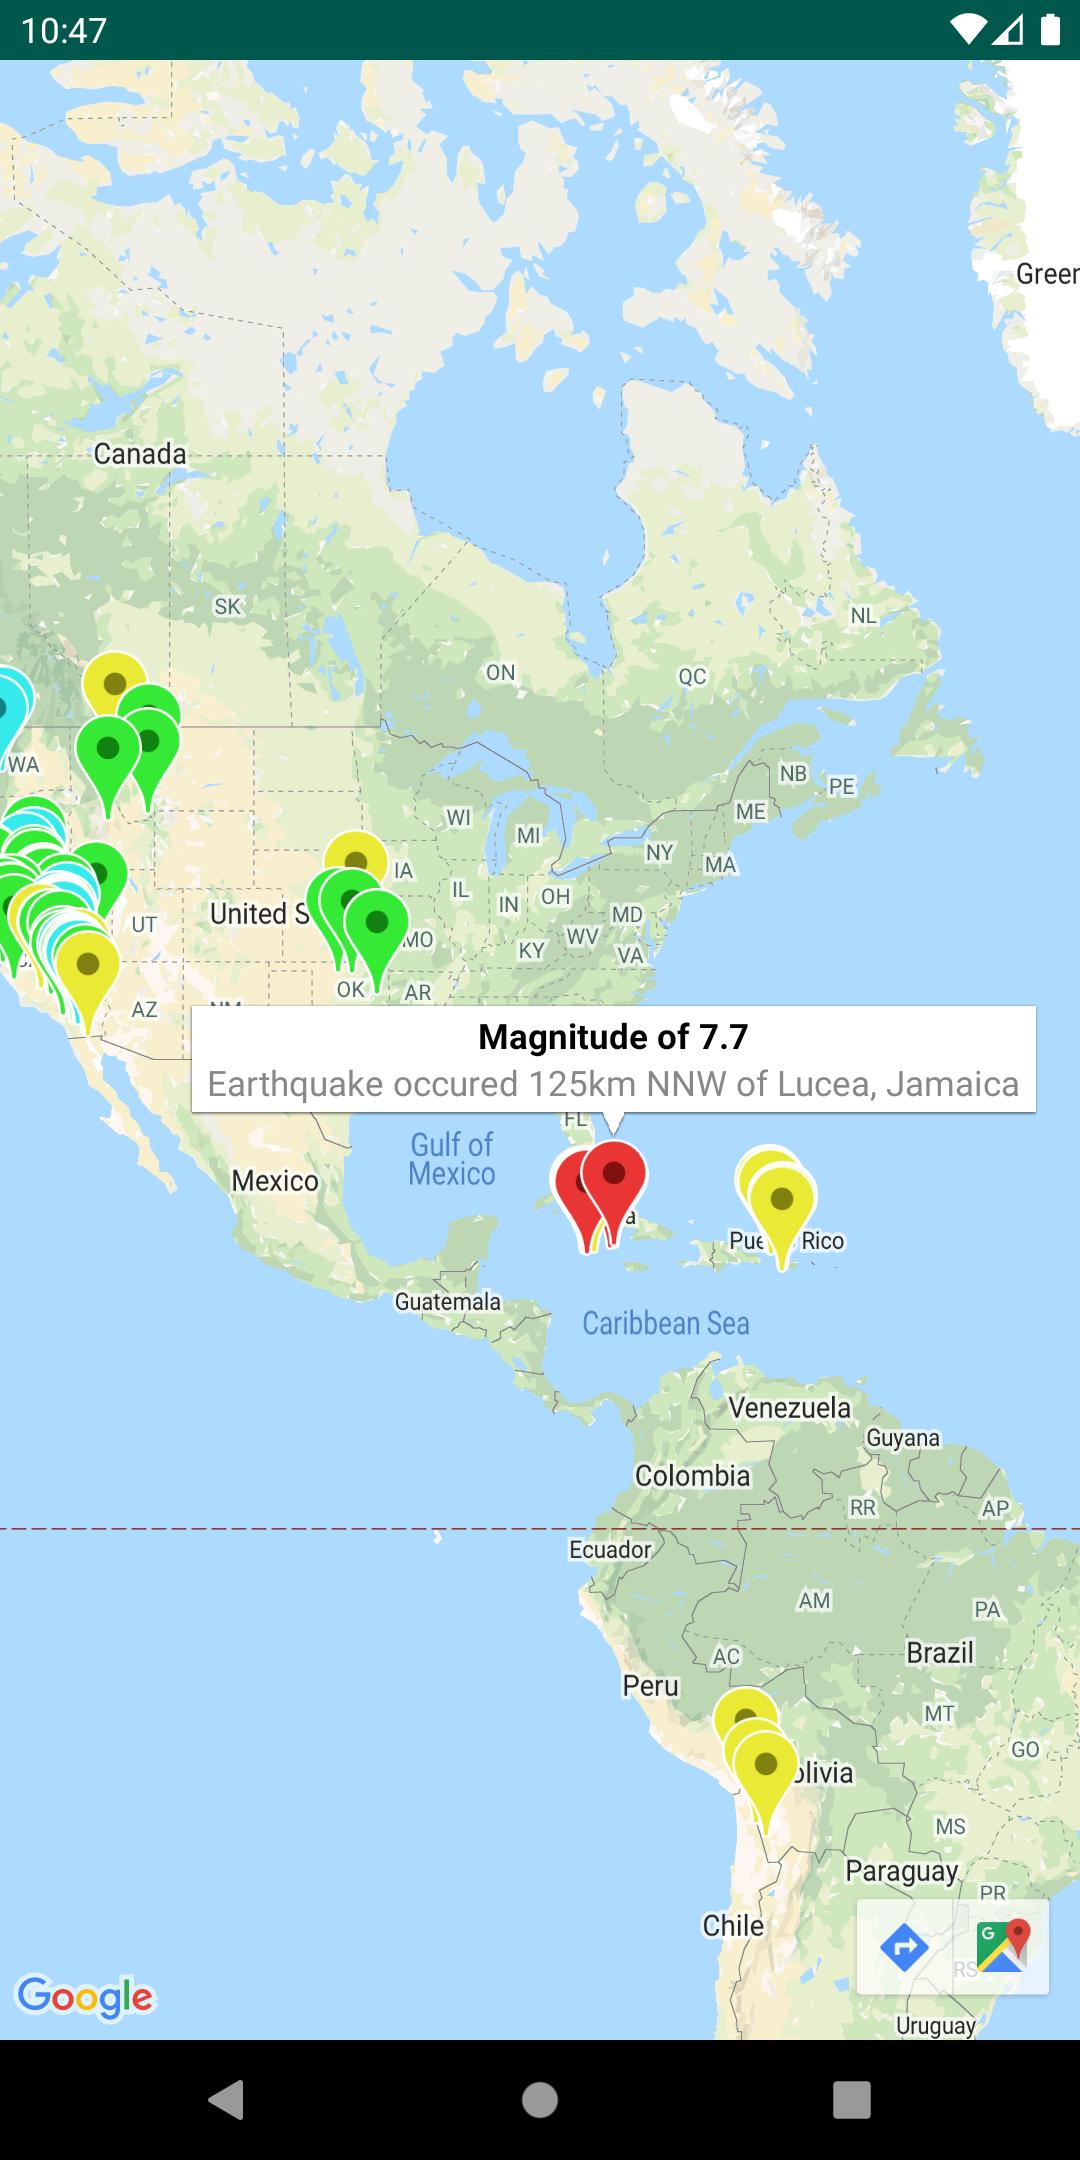 Mapa con una capa GeoJSON